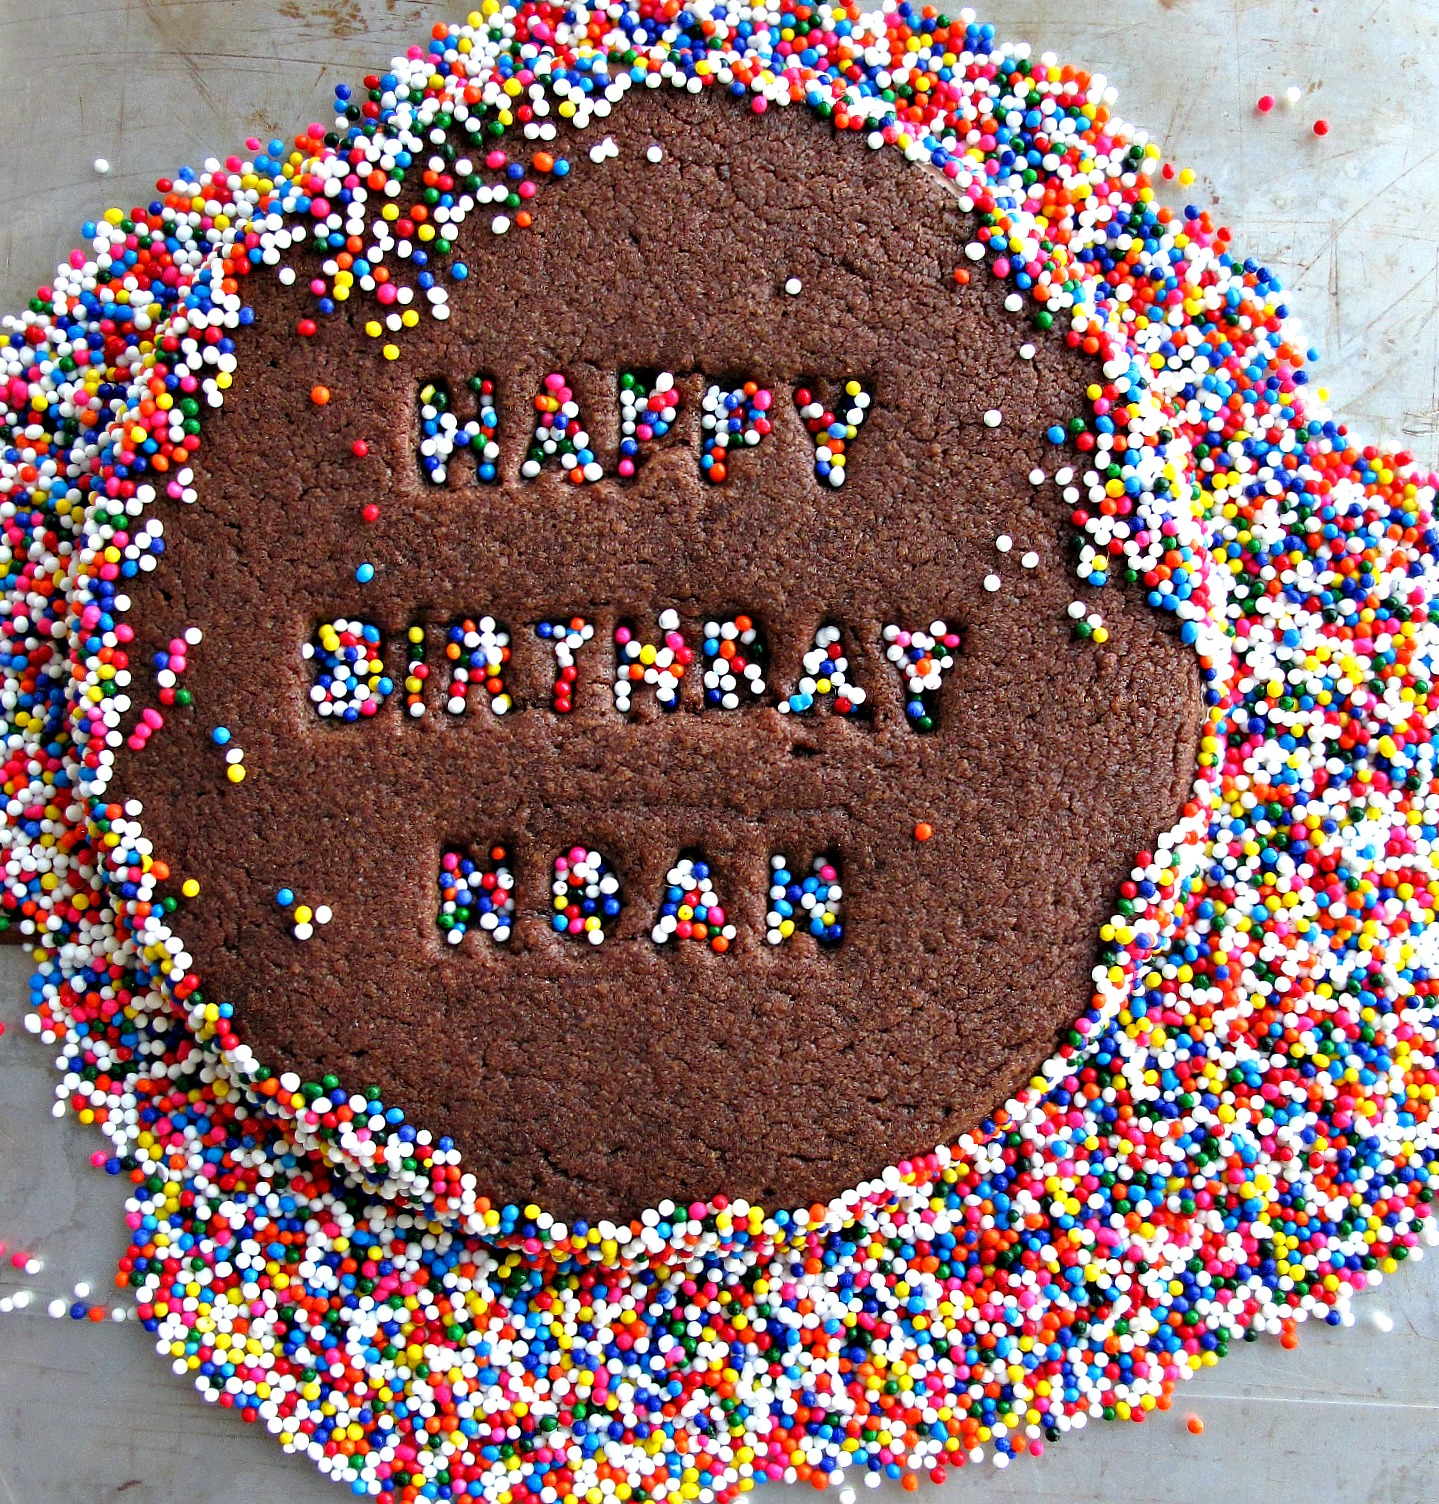 Celebration Sprinkle Cookies - The Monday Box